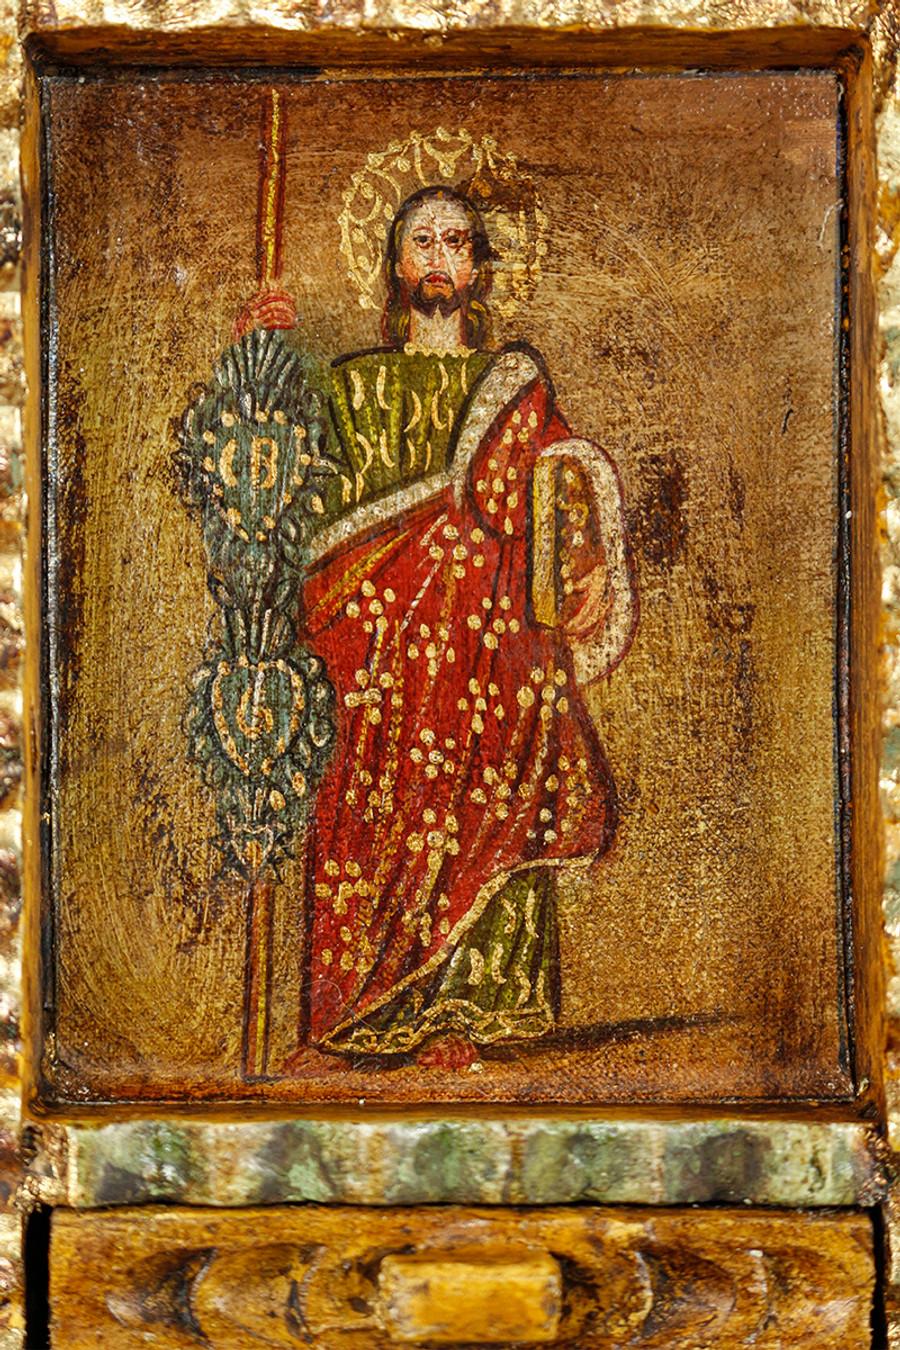 Saint Jude Colonial Peru Art Handmade Retablo Handcarved Altarpiece (71-100-04436)